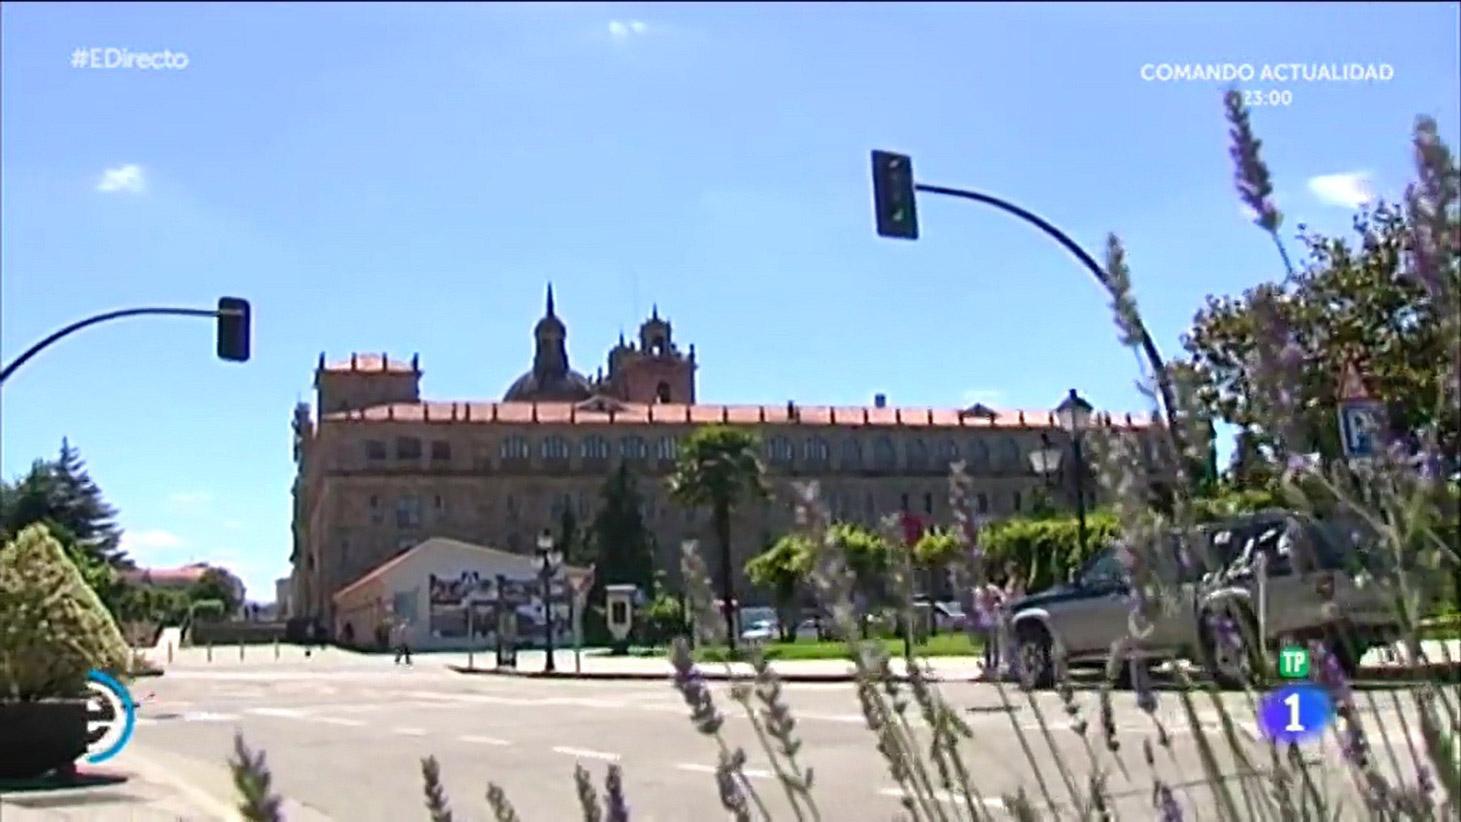 Calzados Losal Monforte, Lugo